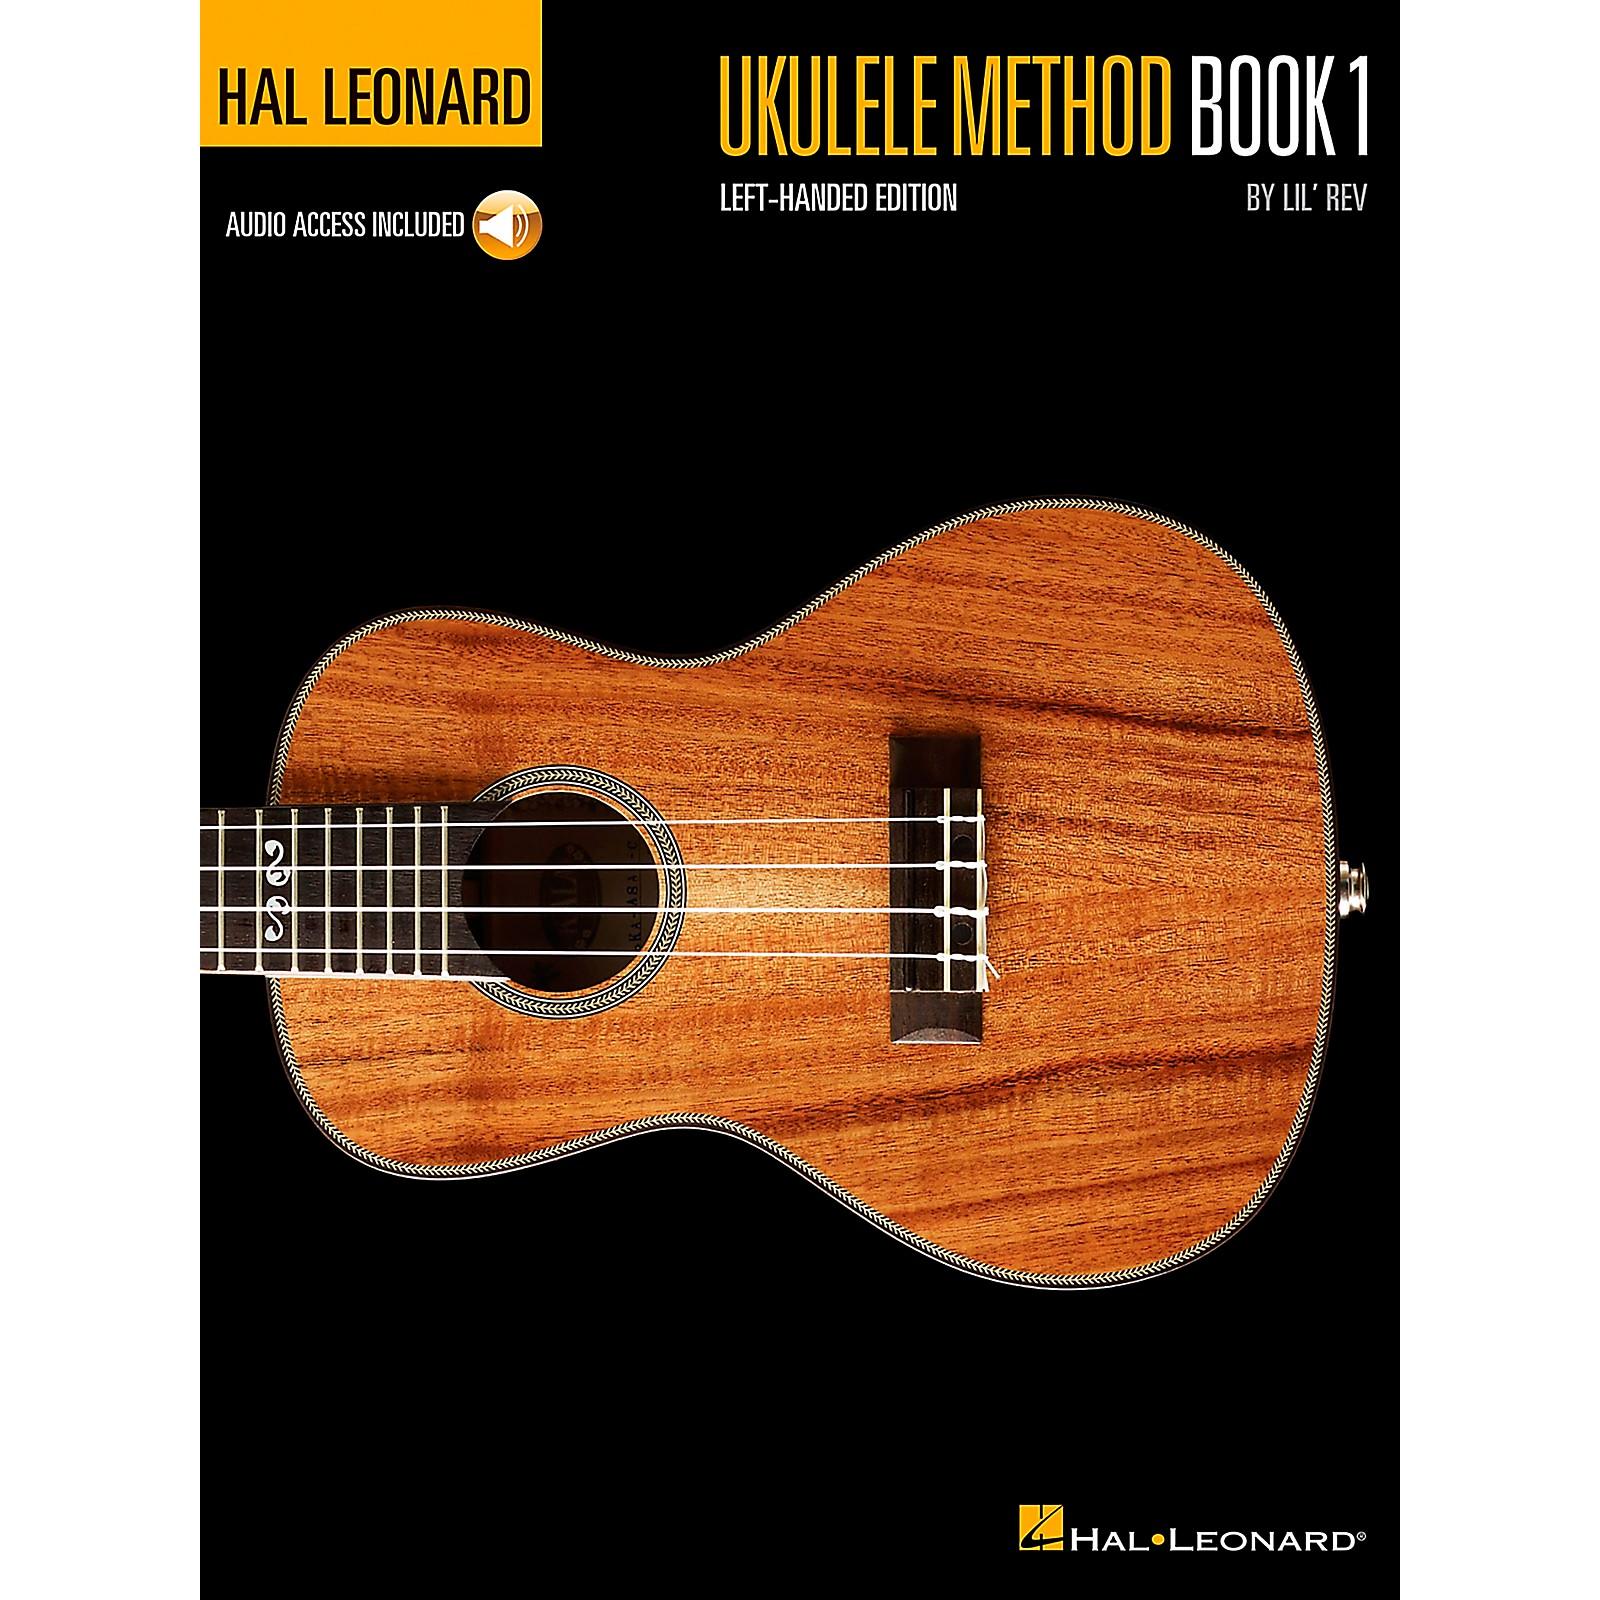 Hal Leonard Ukulele Method Book 1  Left-Handed Edition Book/Online Audio